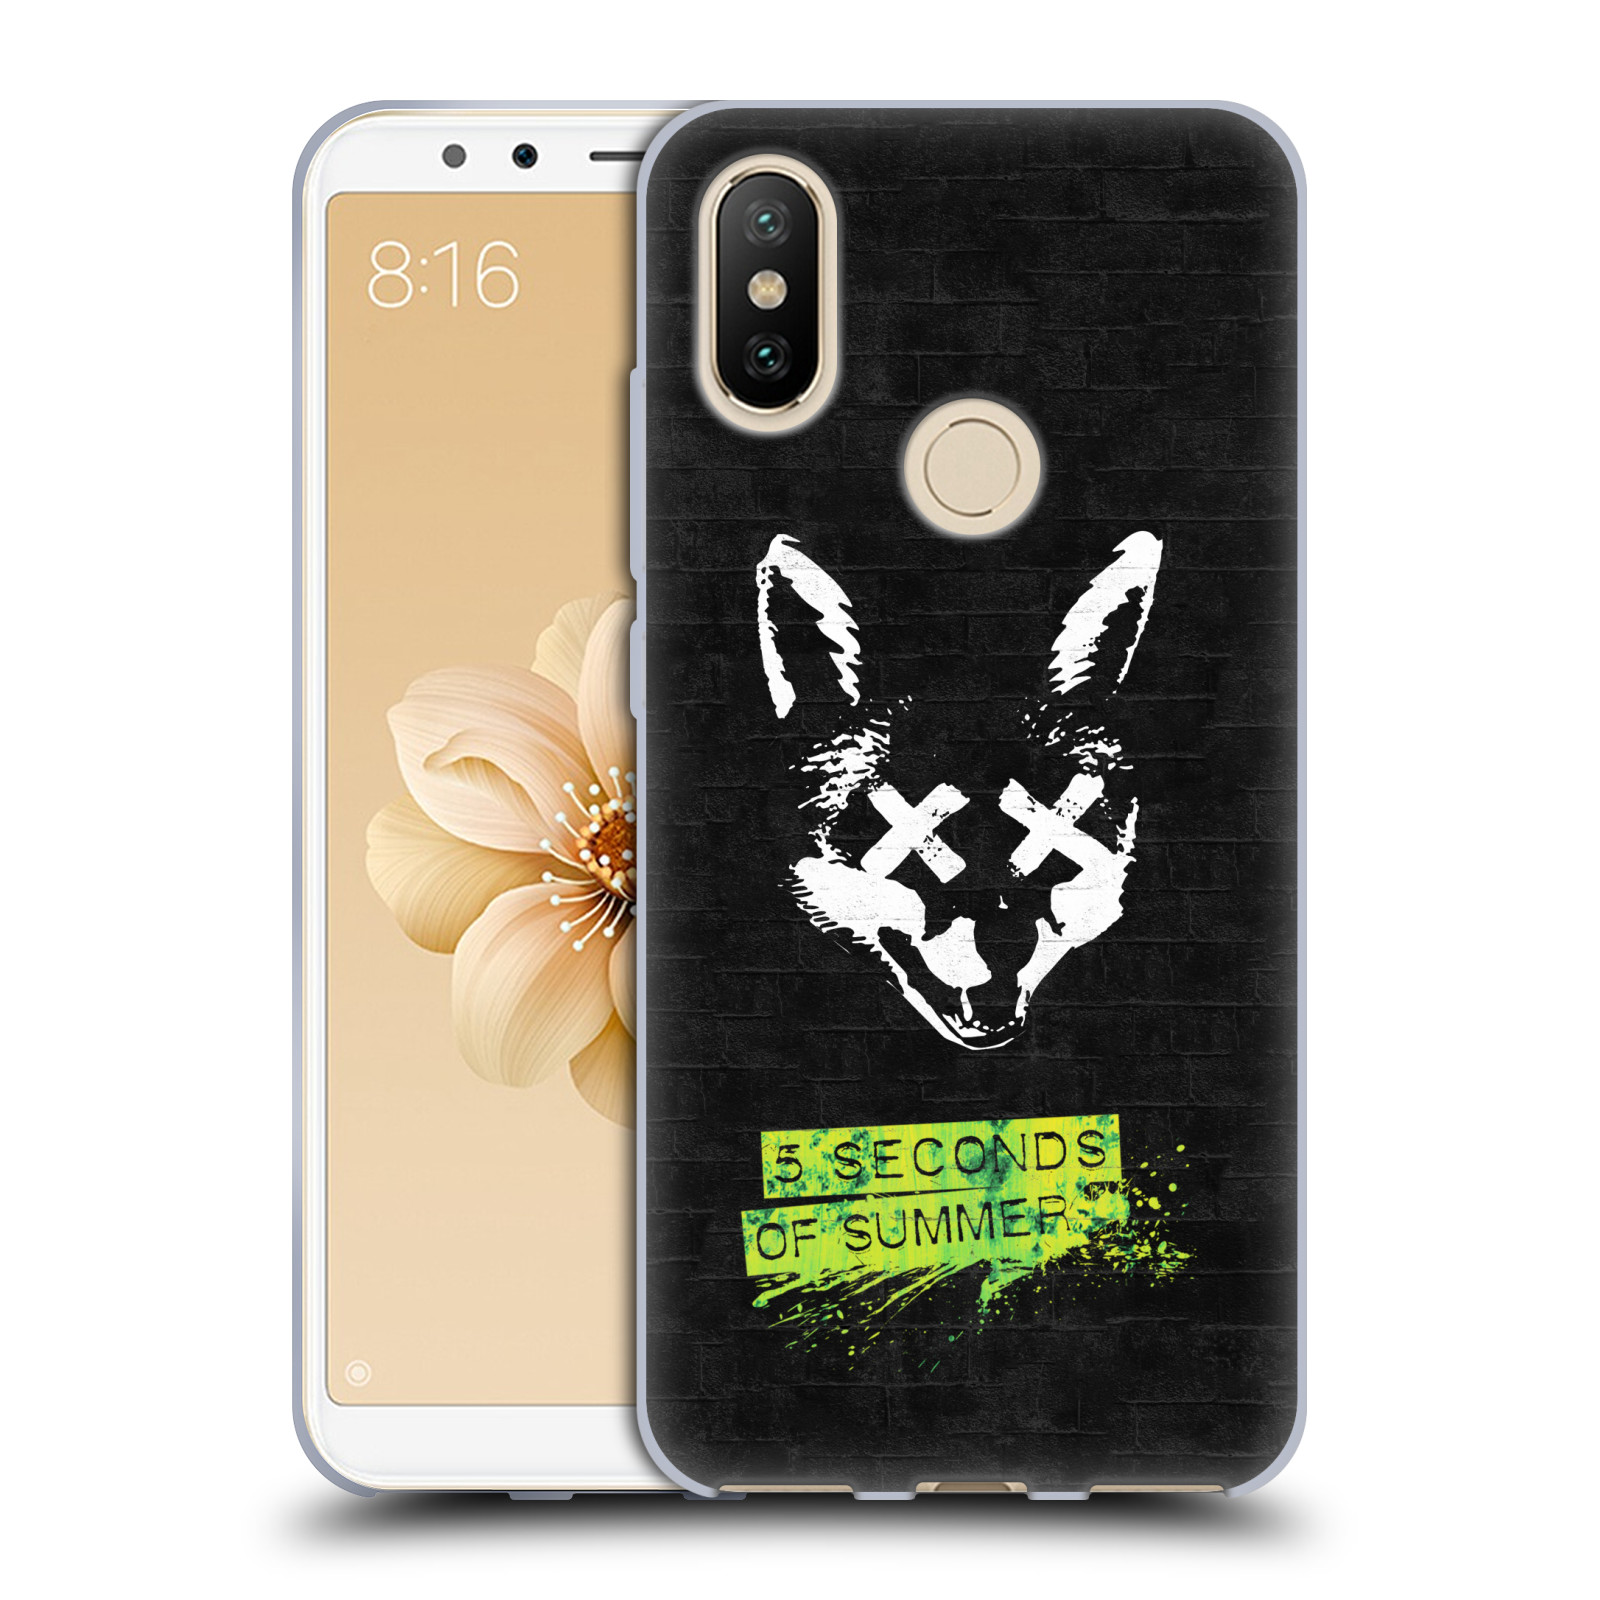 Silikonové pouzdro na mobil Xiaomi Mi A2 - Head Case - 5 Seconds of Summer - Fox